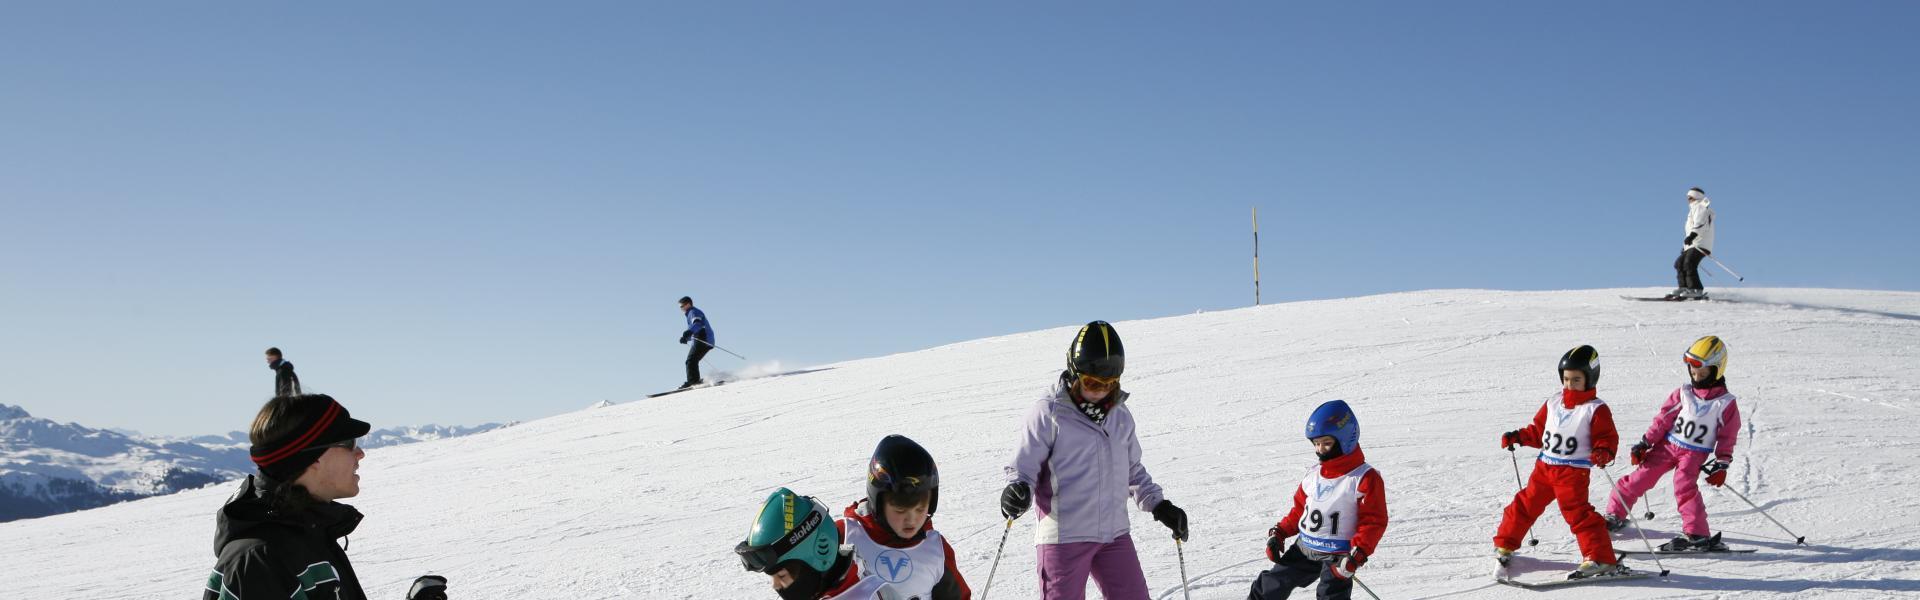 Ski School Sterzing Vipiteno Rosskopf Monte Cavallo South Tyrol